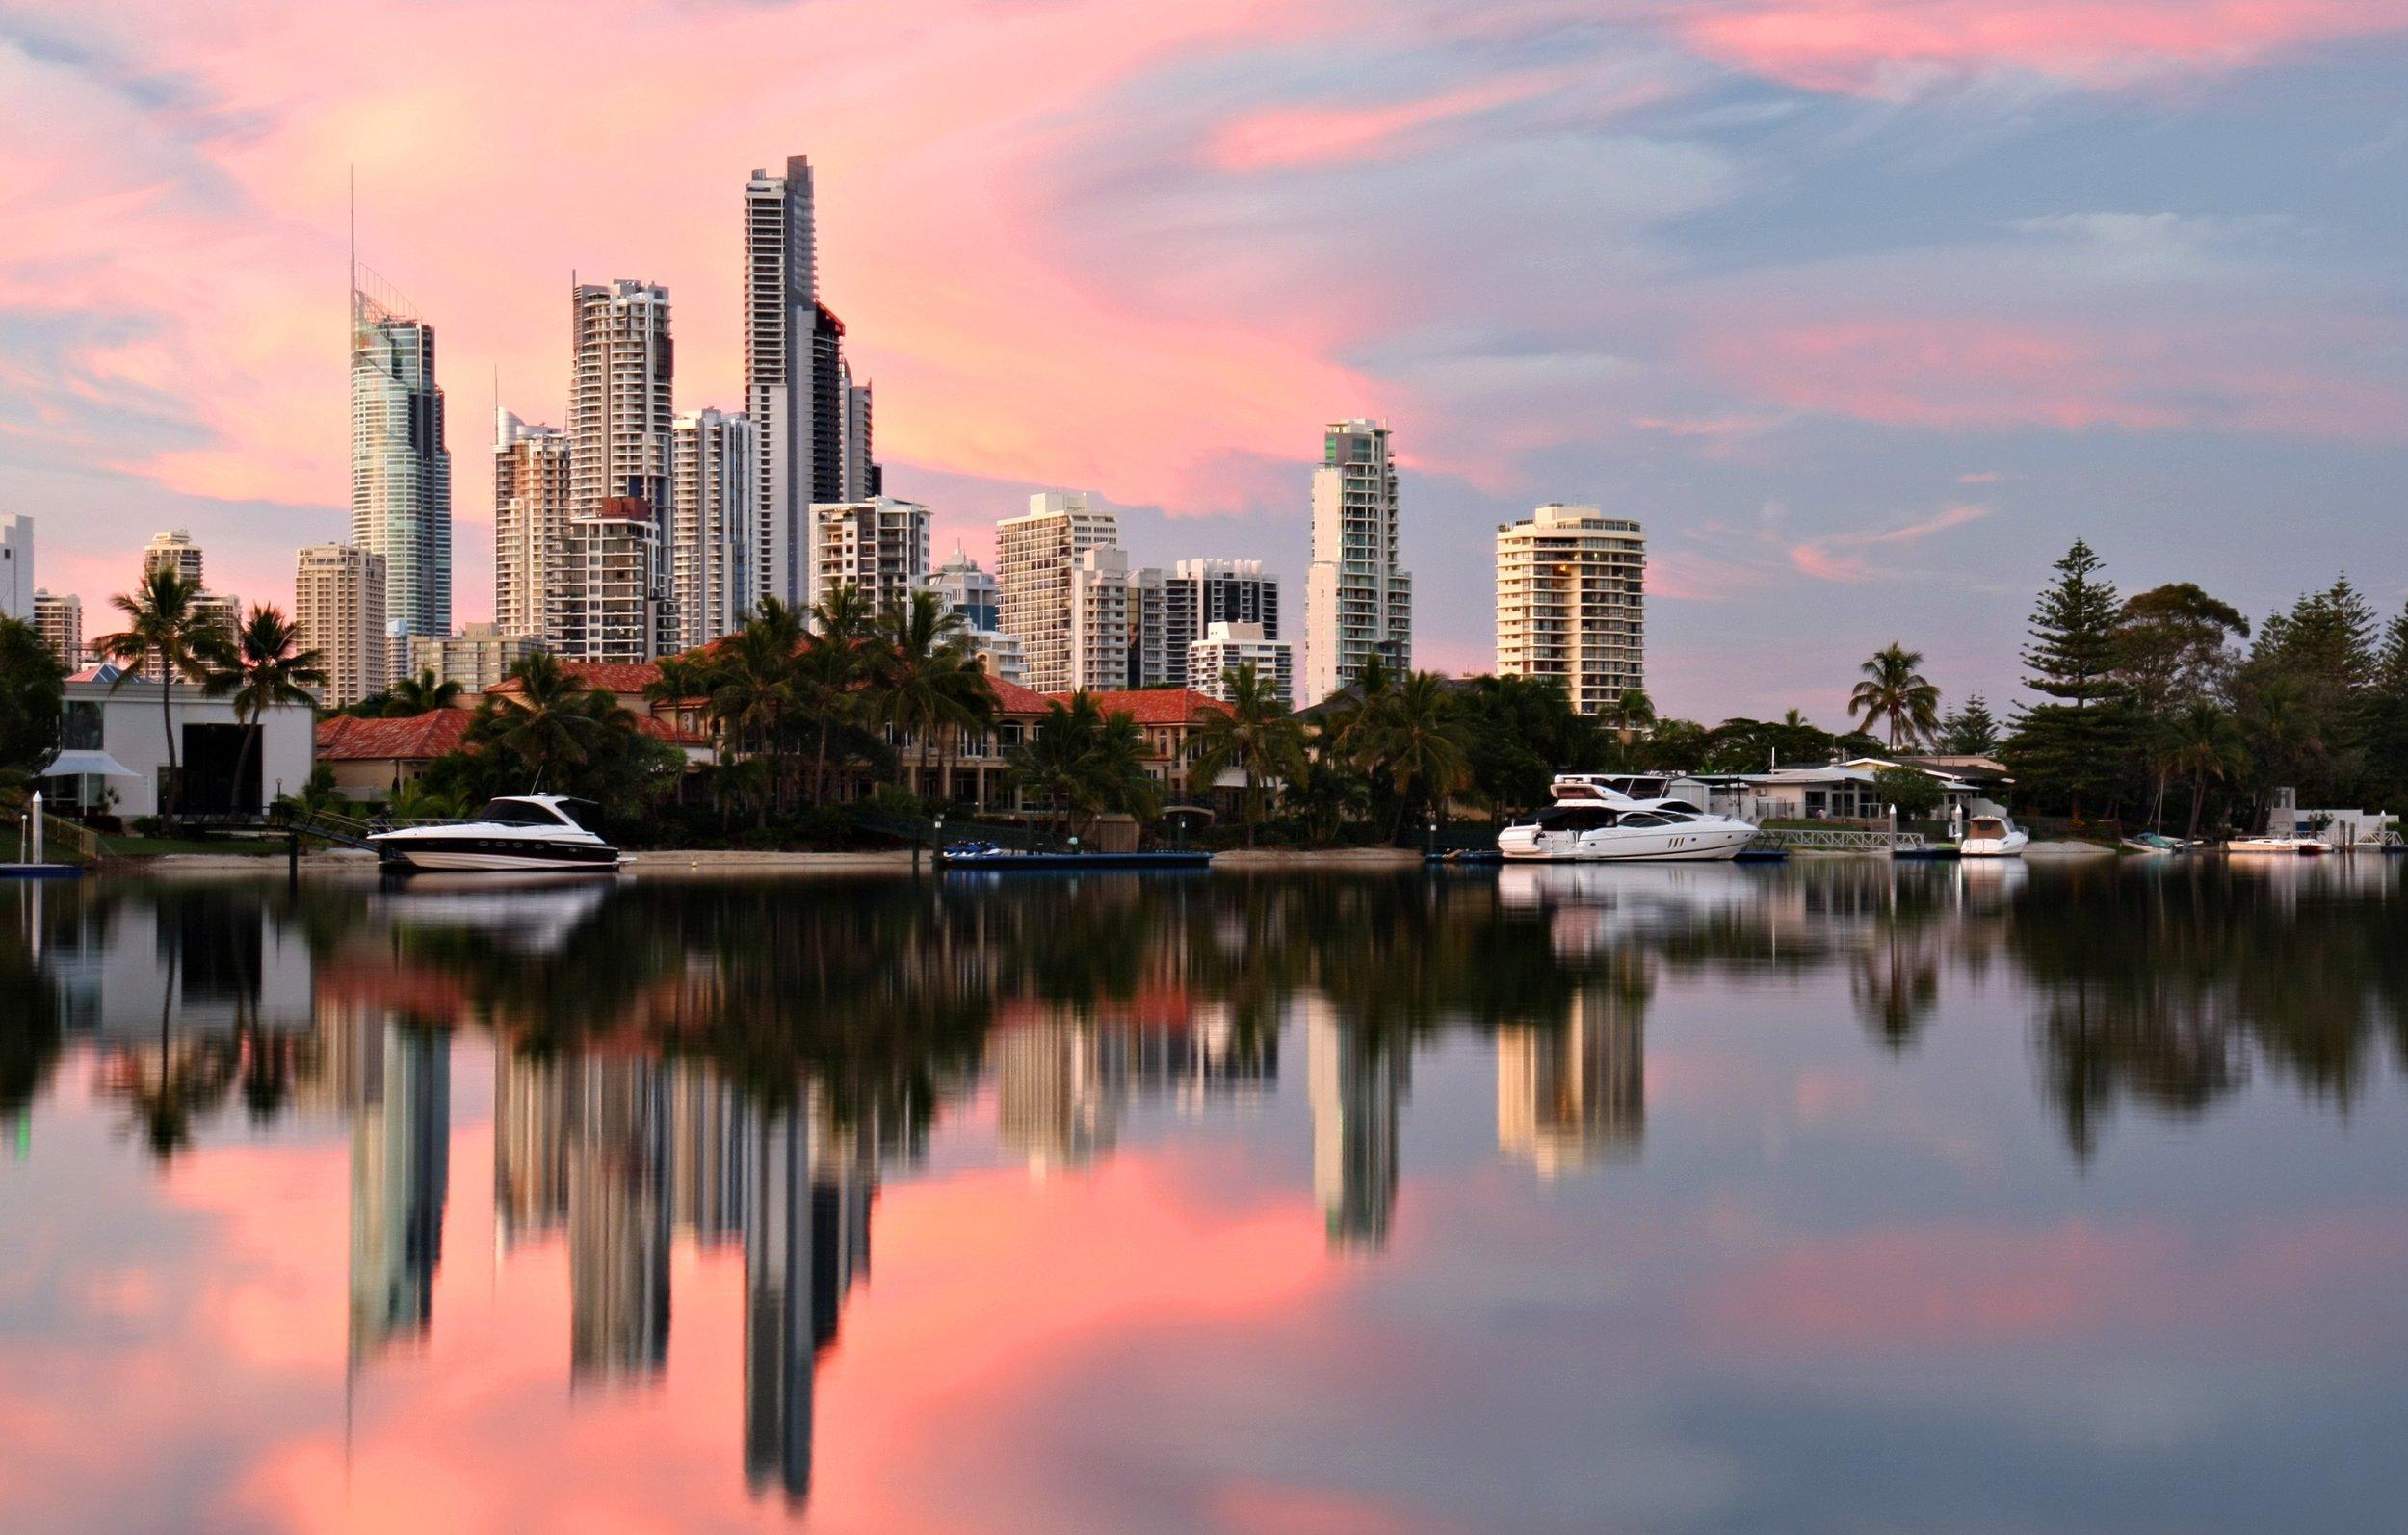 gold coast, australia - Sep 2017